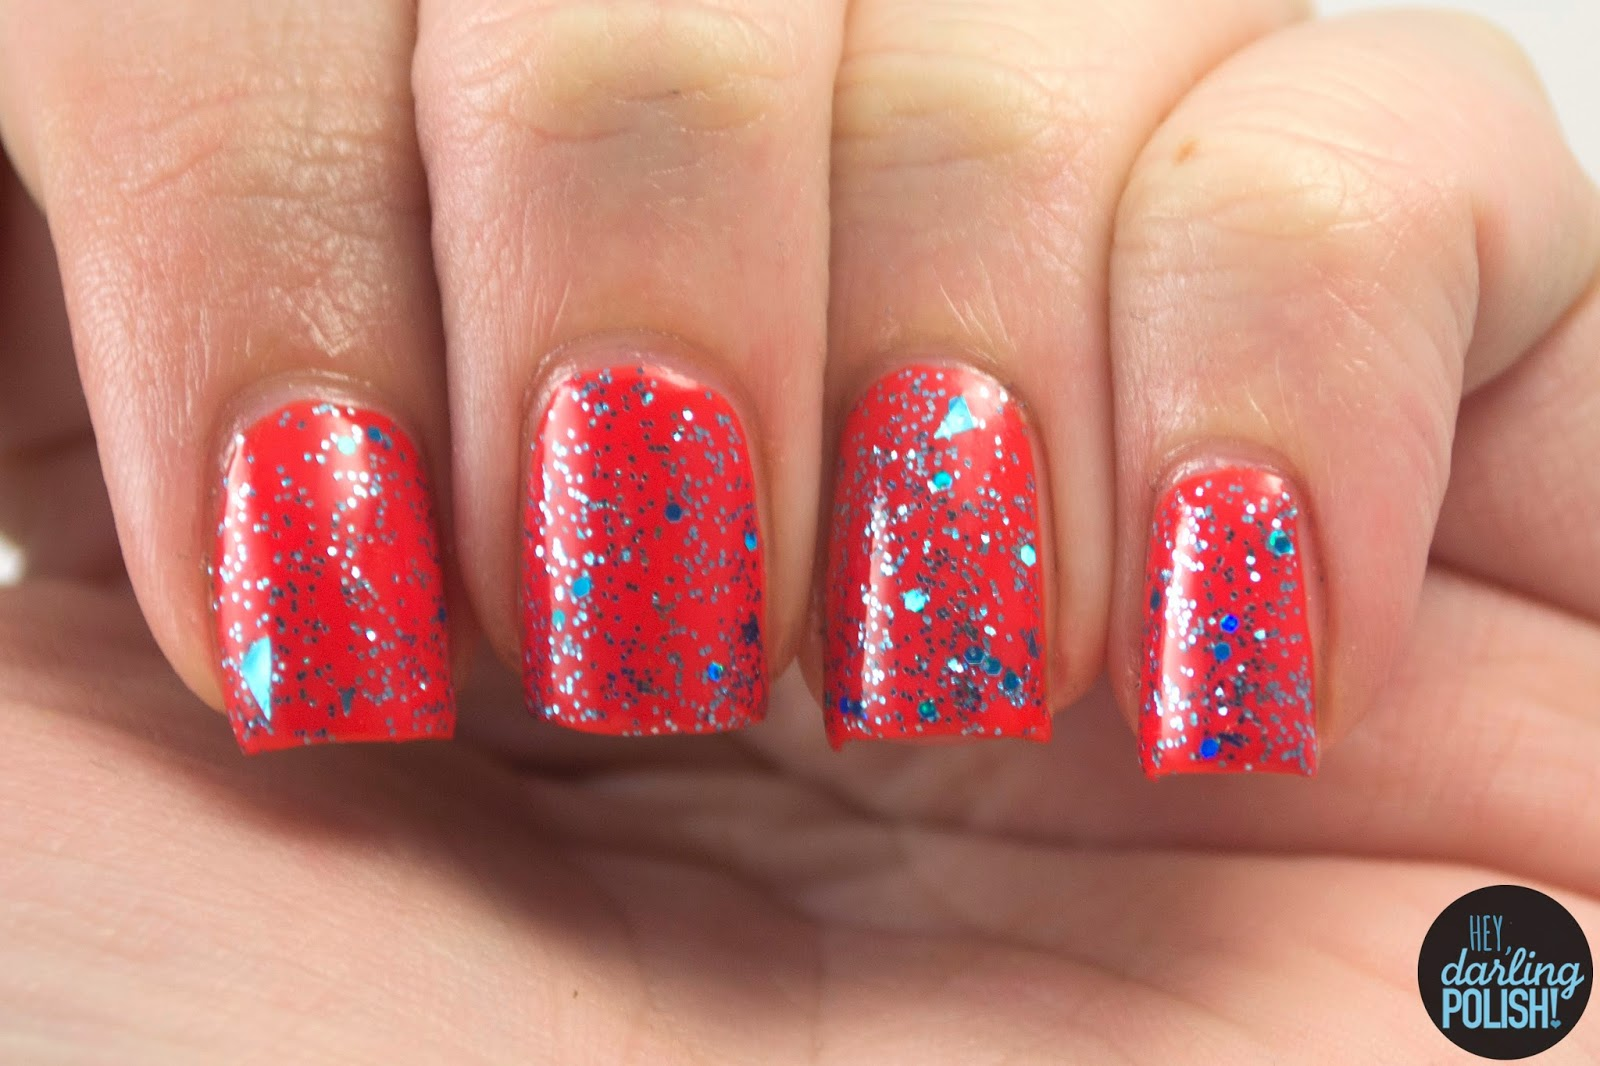 shotgun wedding, nails, nail polish, polish, indie, indie polish, indie nail polish, shirley ann nail lacquer, glitter, blue, hey darling polish